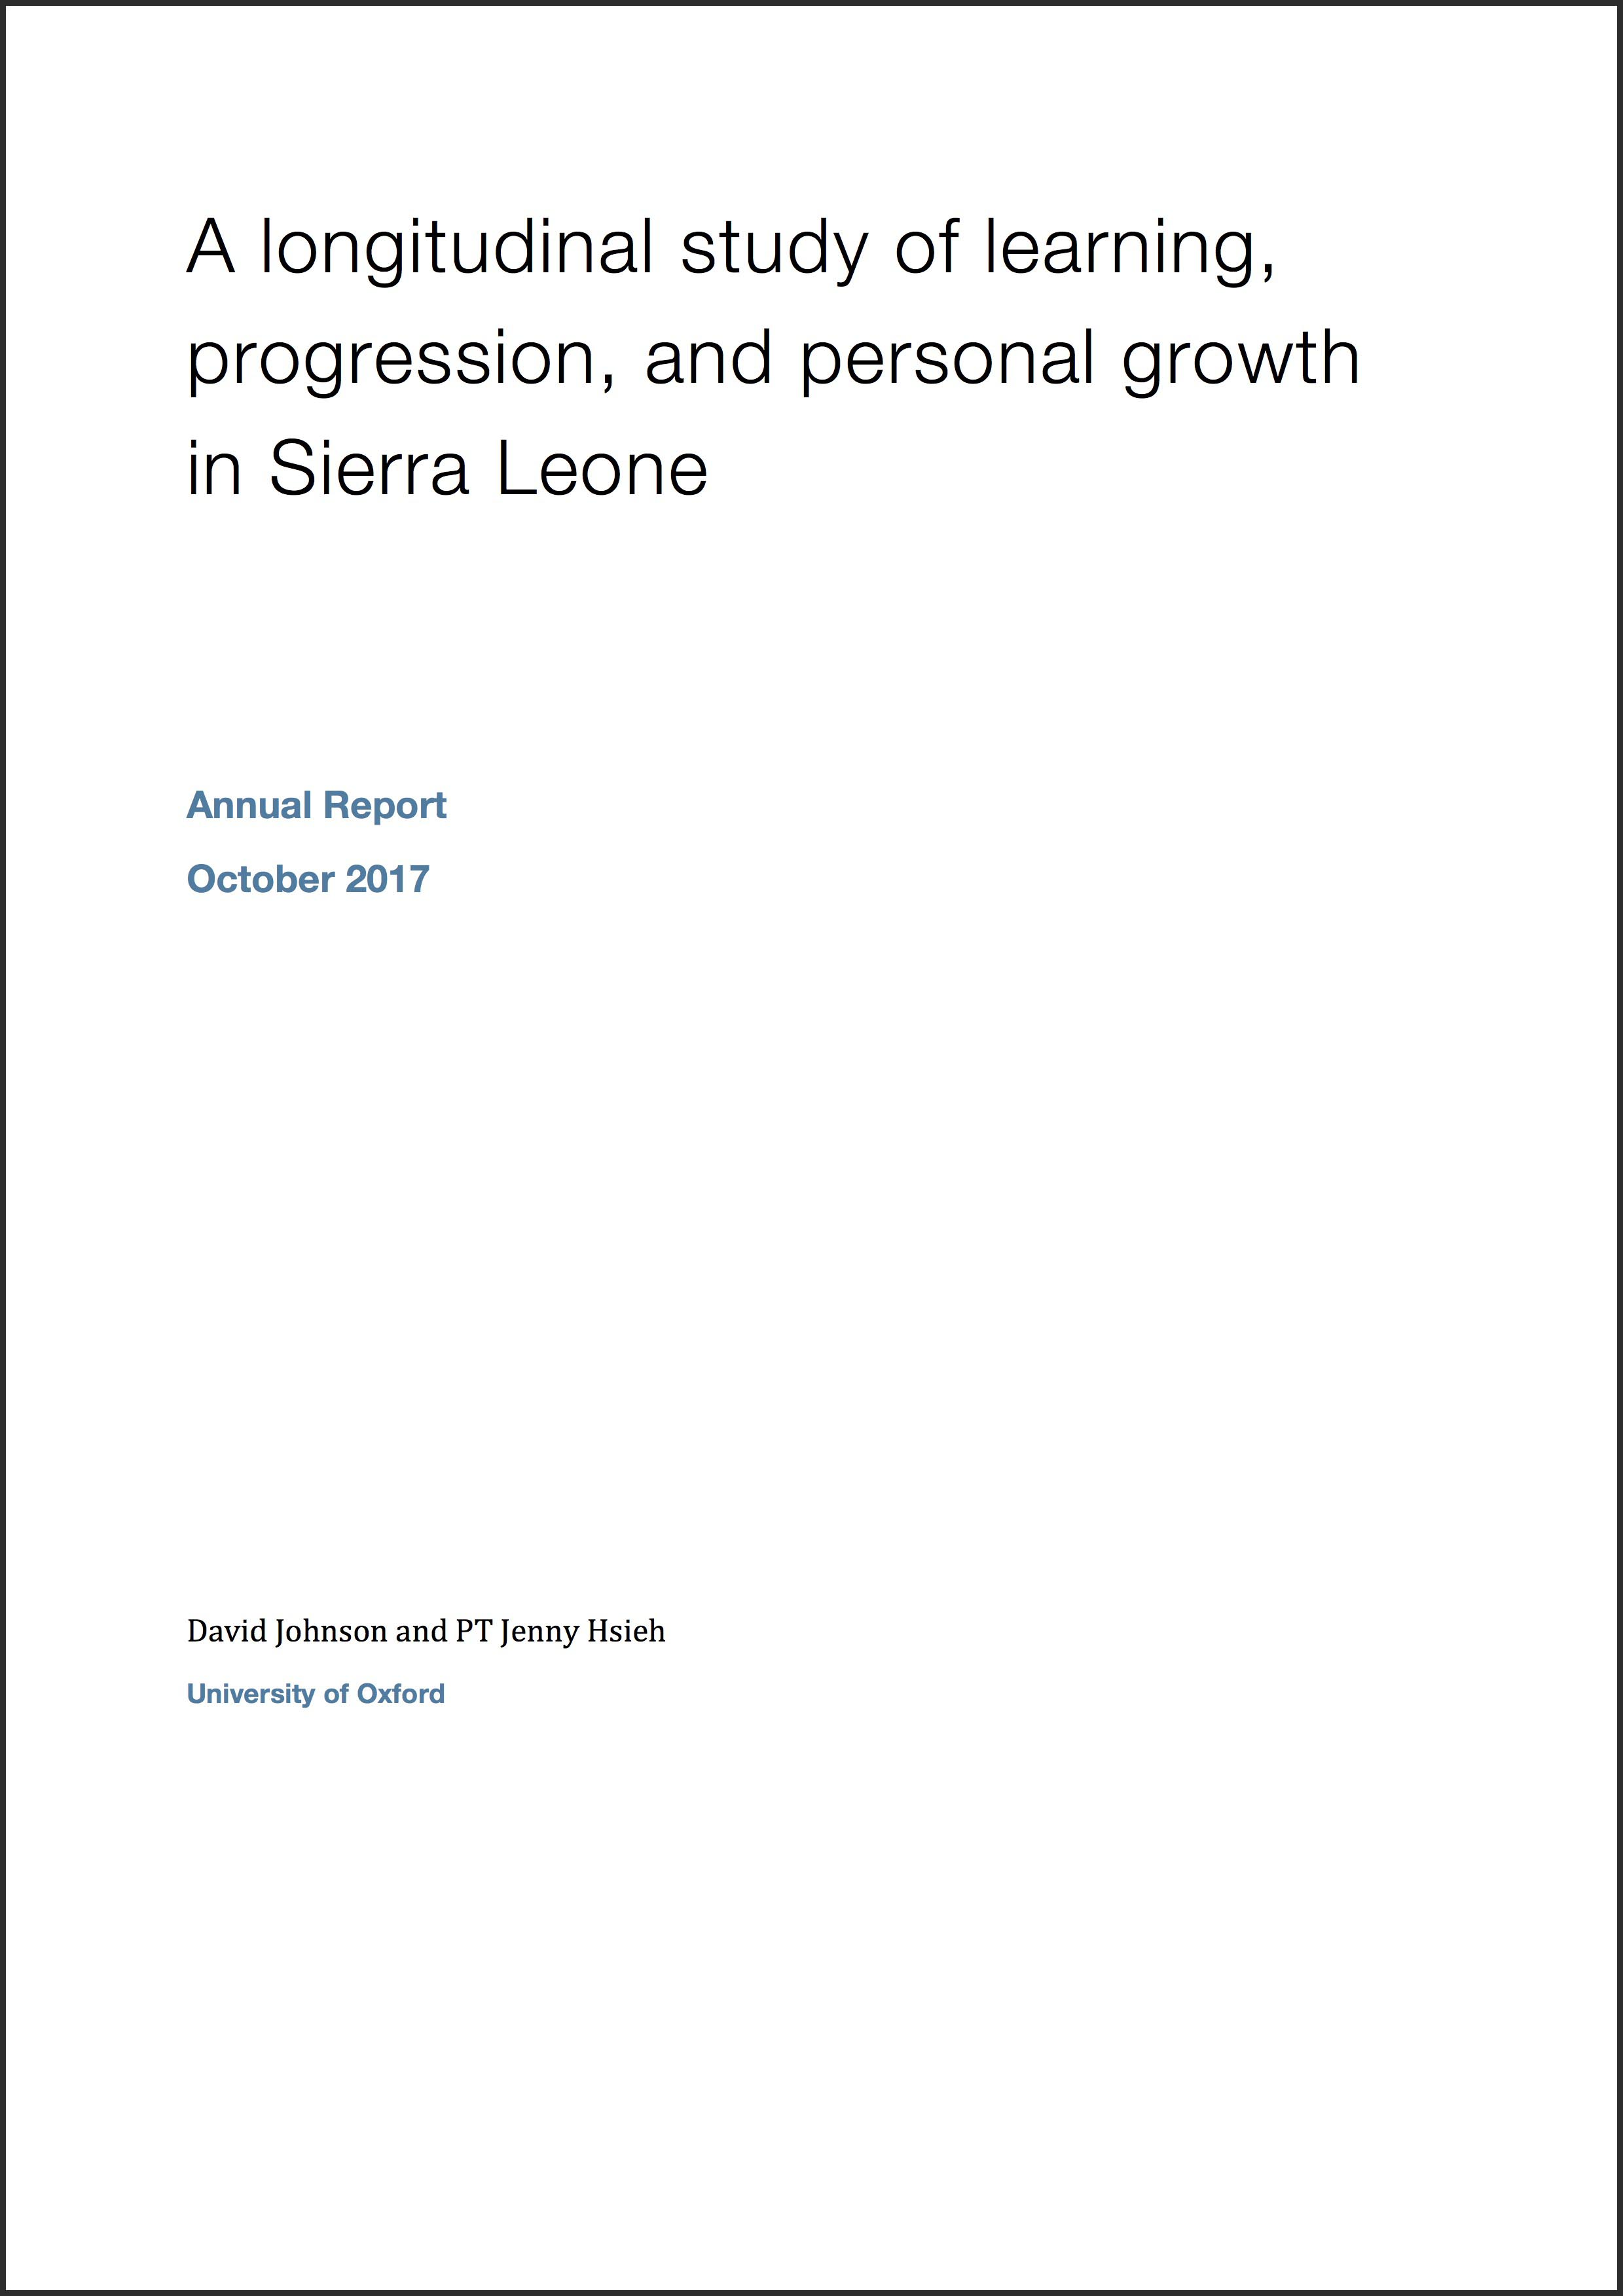 Oxford Second Annual Report Cover copy.jpg